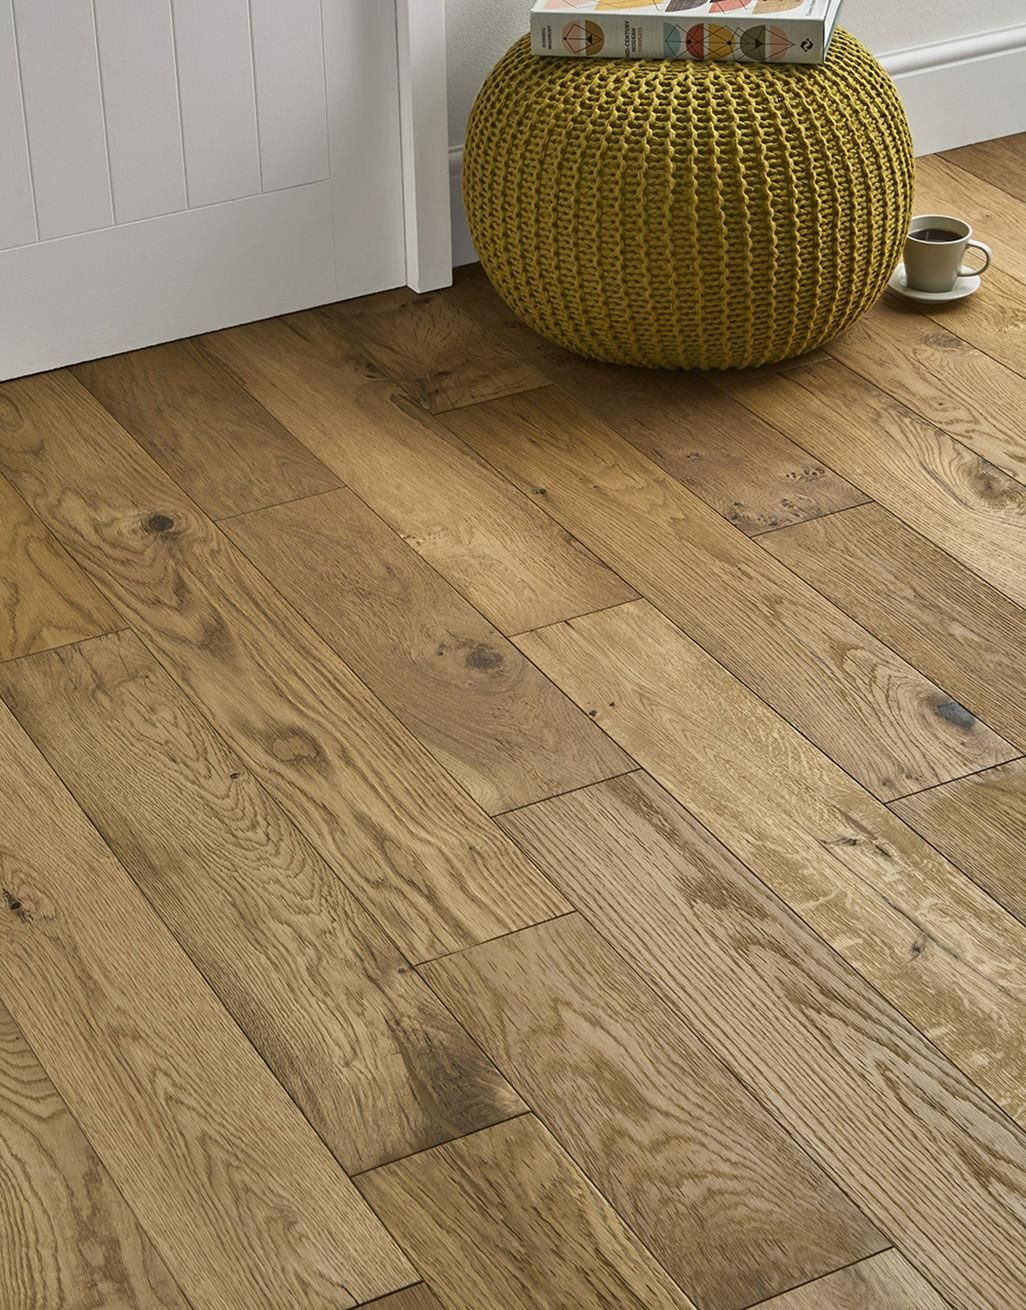 Loft Natural Oak Brushed Oiled Engineered Wood Flooring Direct Wood Flooring